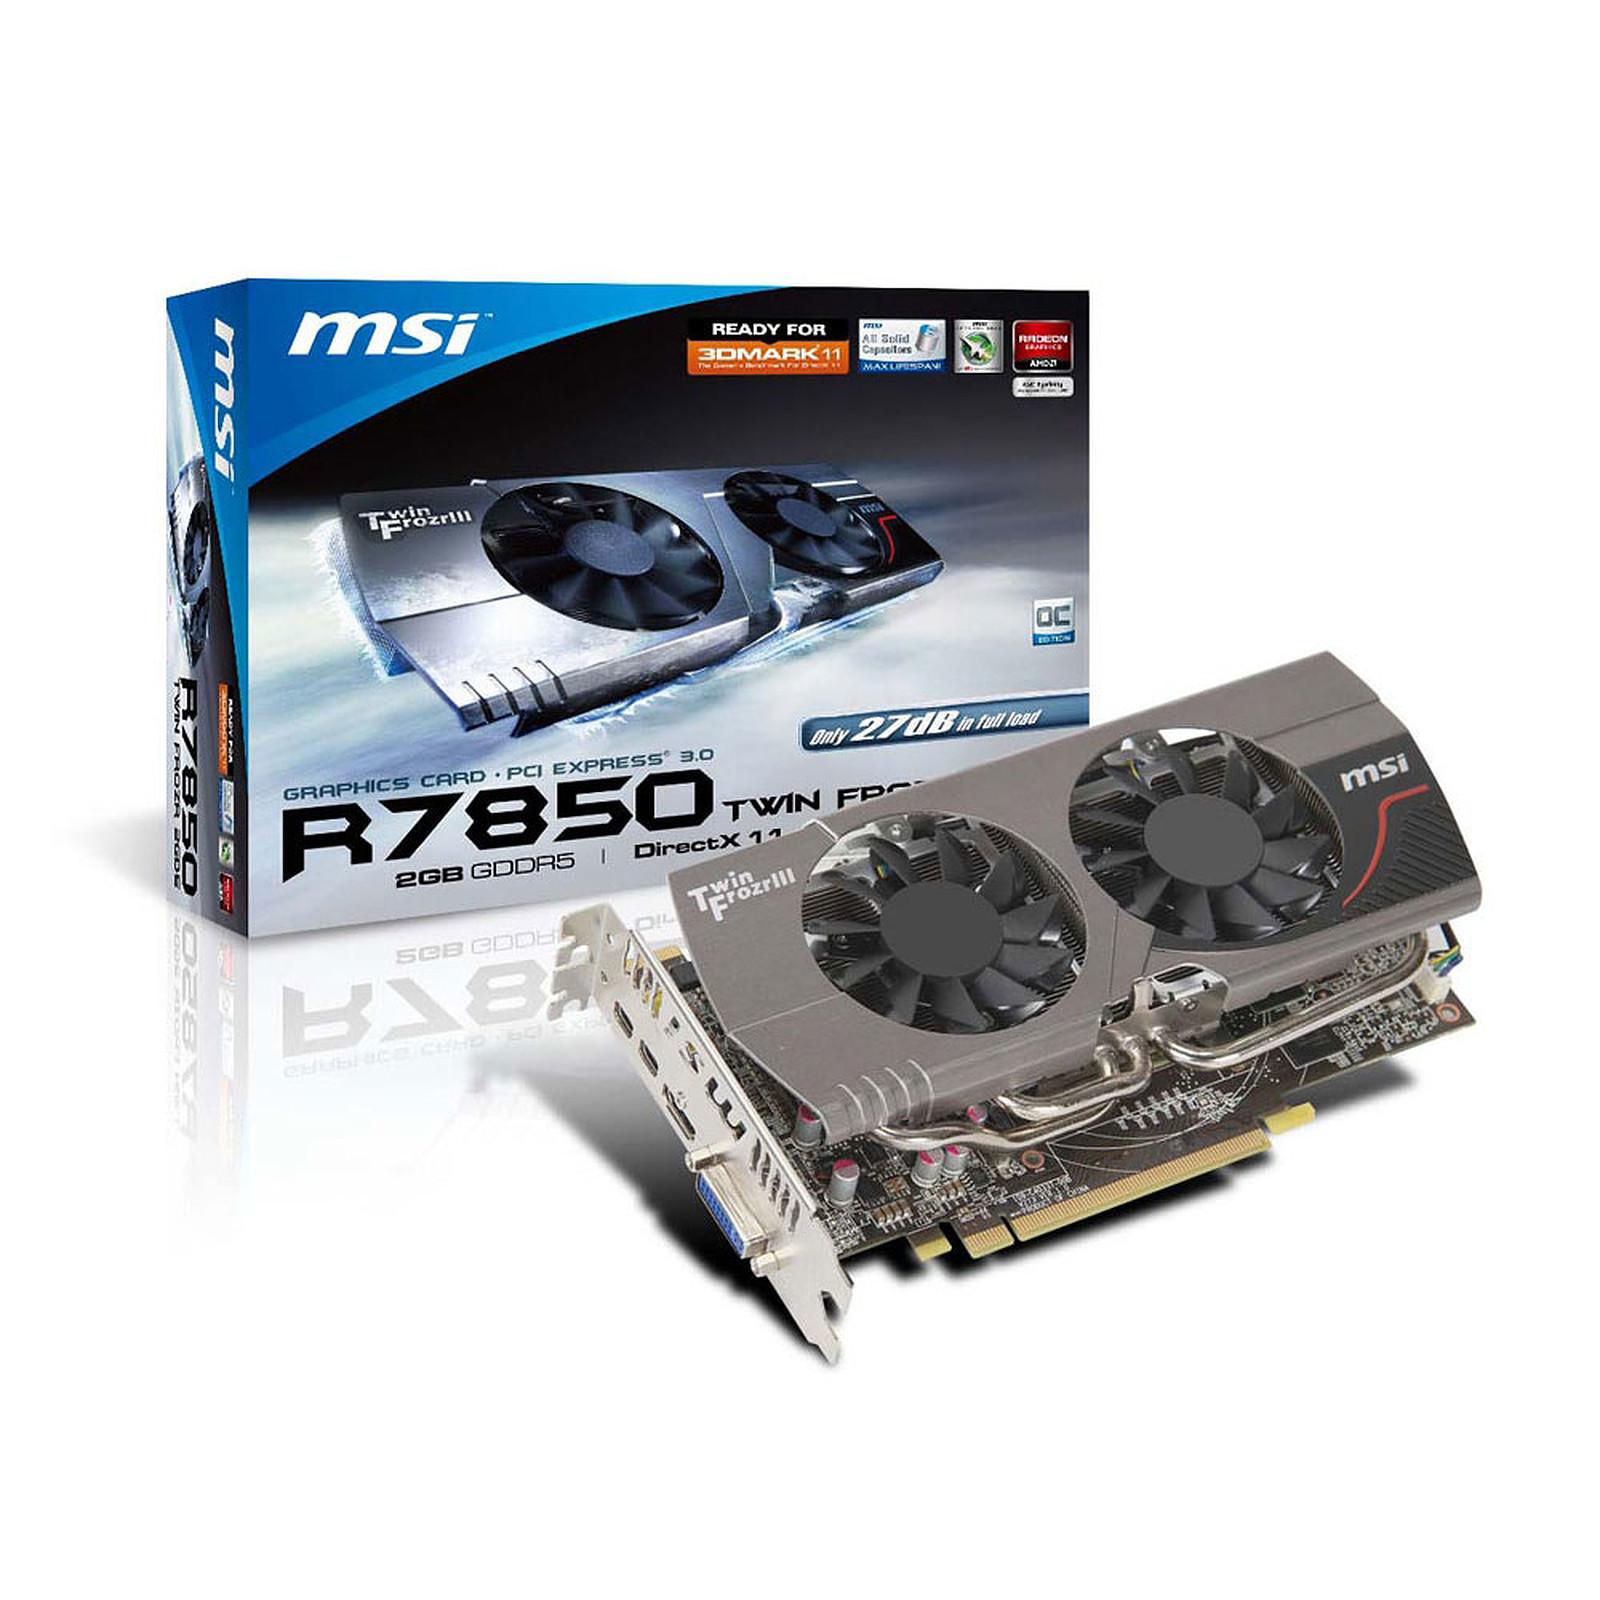 MSI R7850 Twin Frozr 2GD5/OC 2 GB